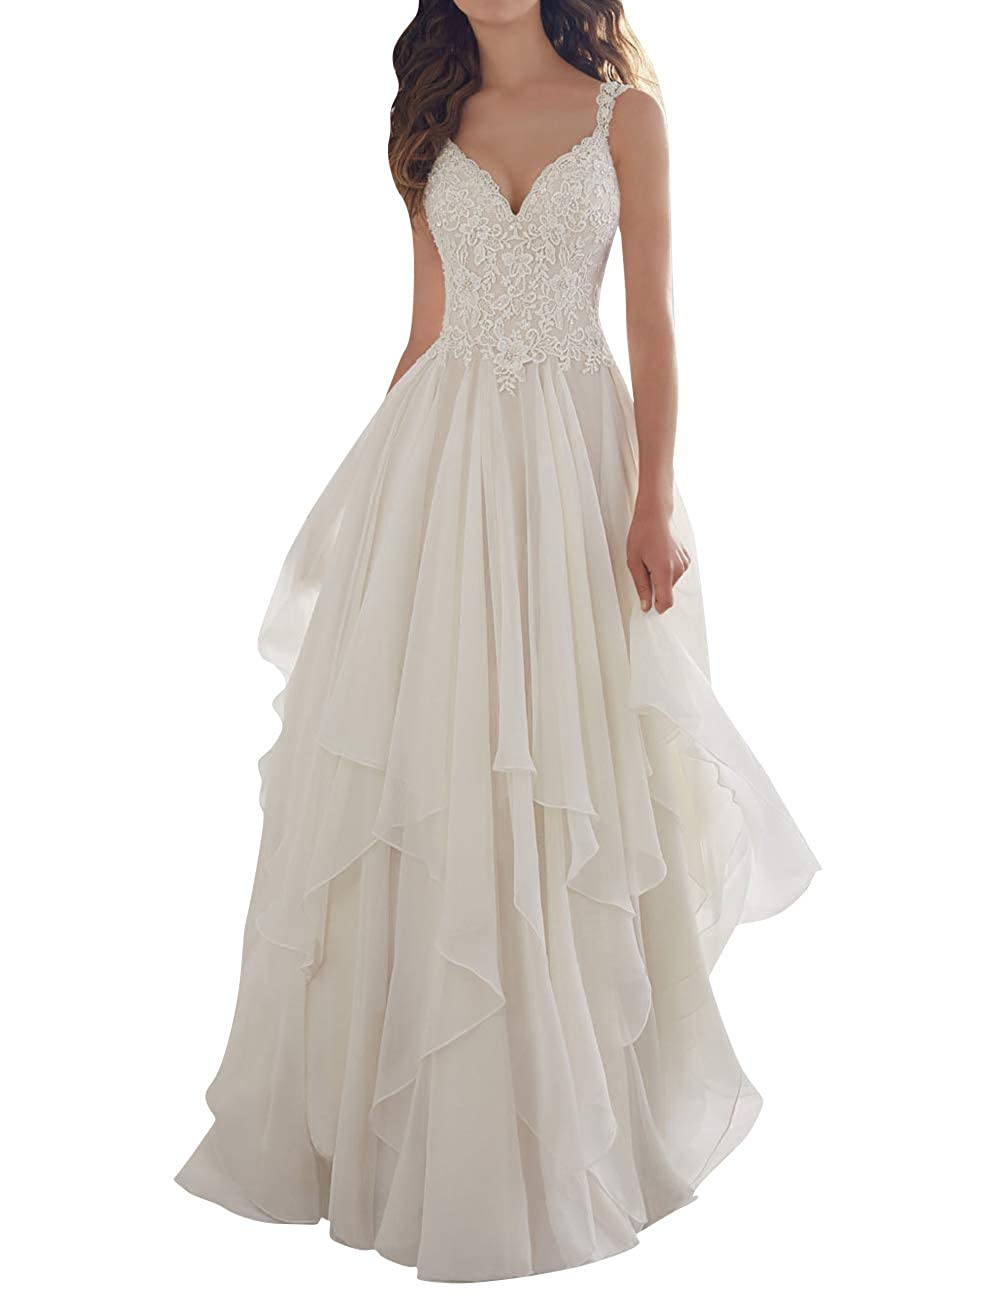 Wedding Dress Lace Bridal Dresses Beach Ruffles A Line Wedding Gown